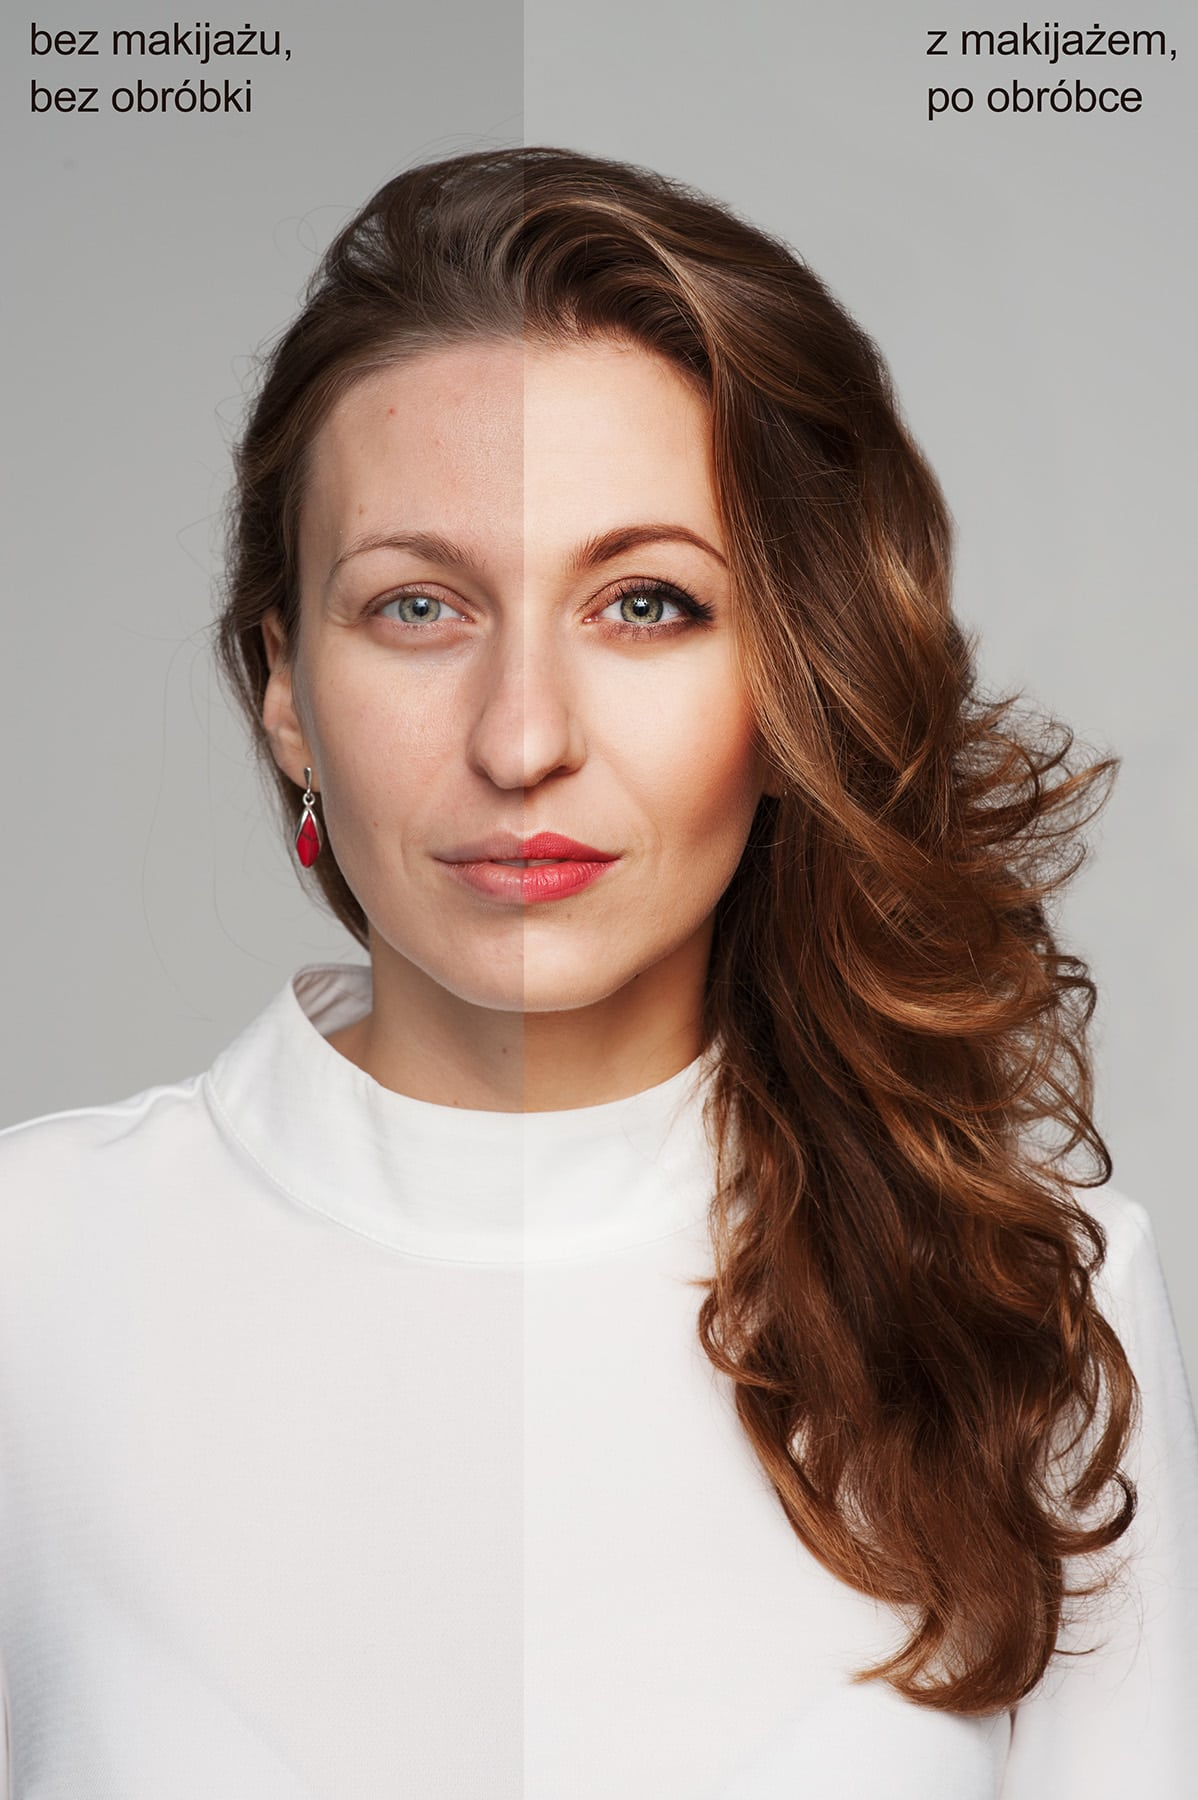 Rola makijażu w sesji portretowej